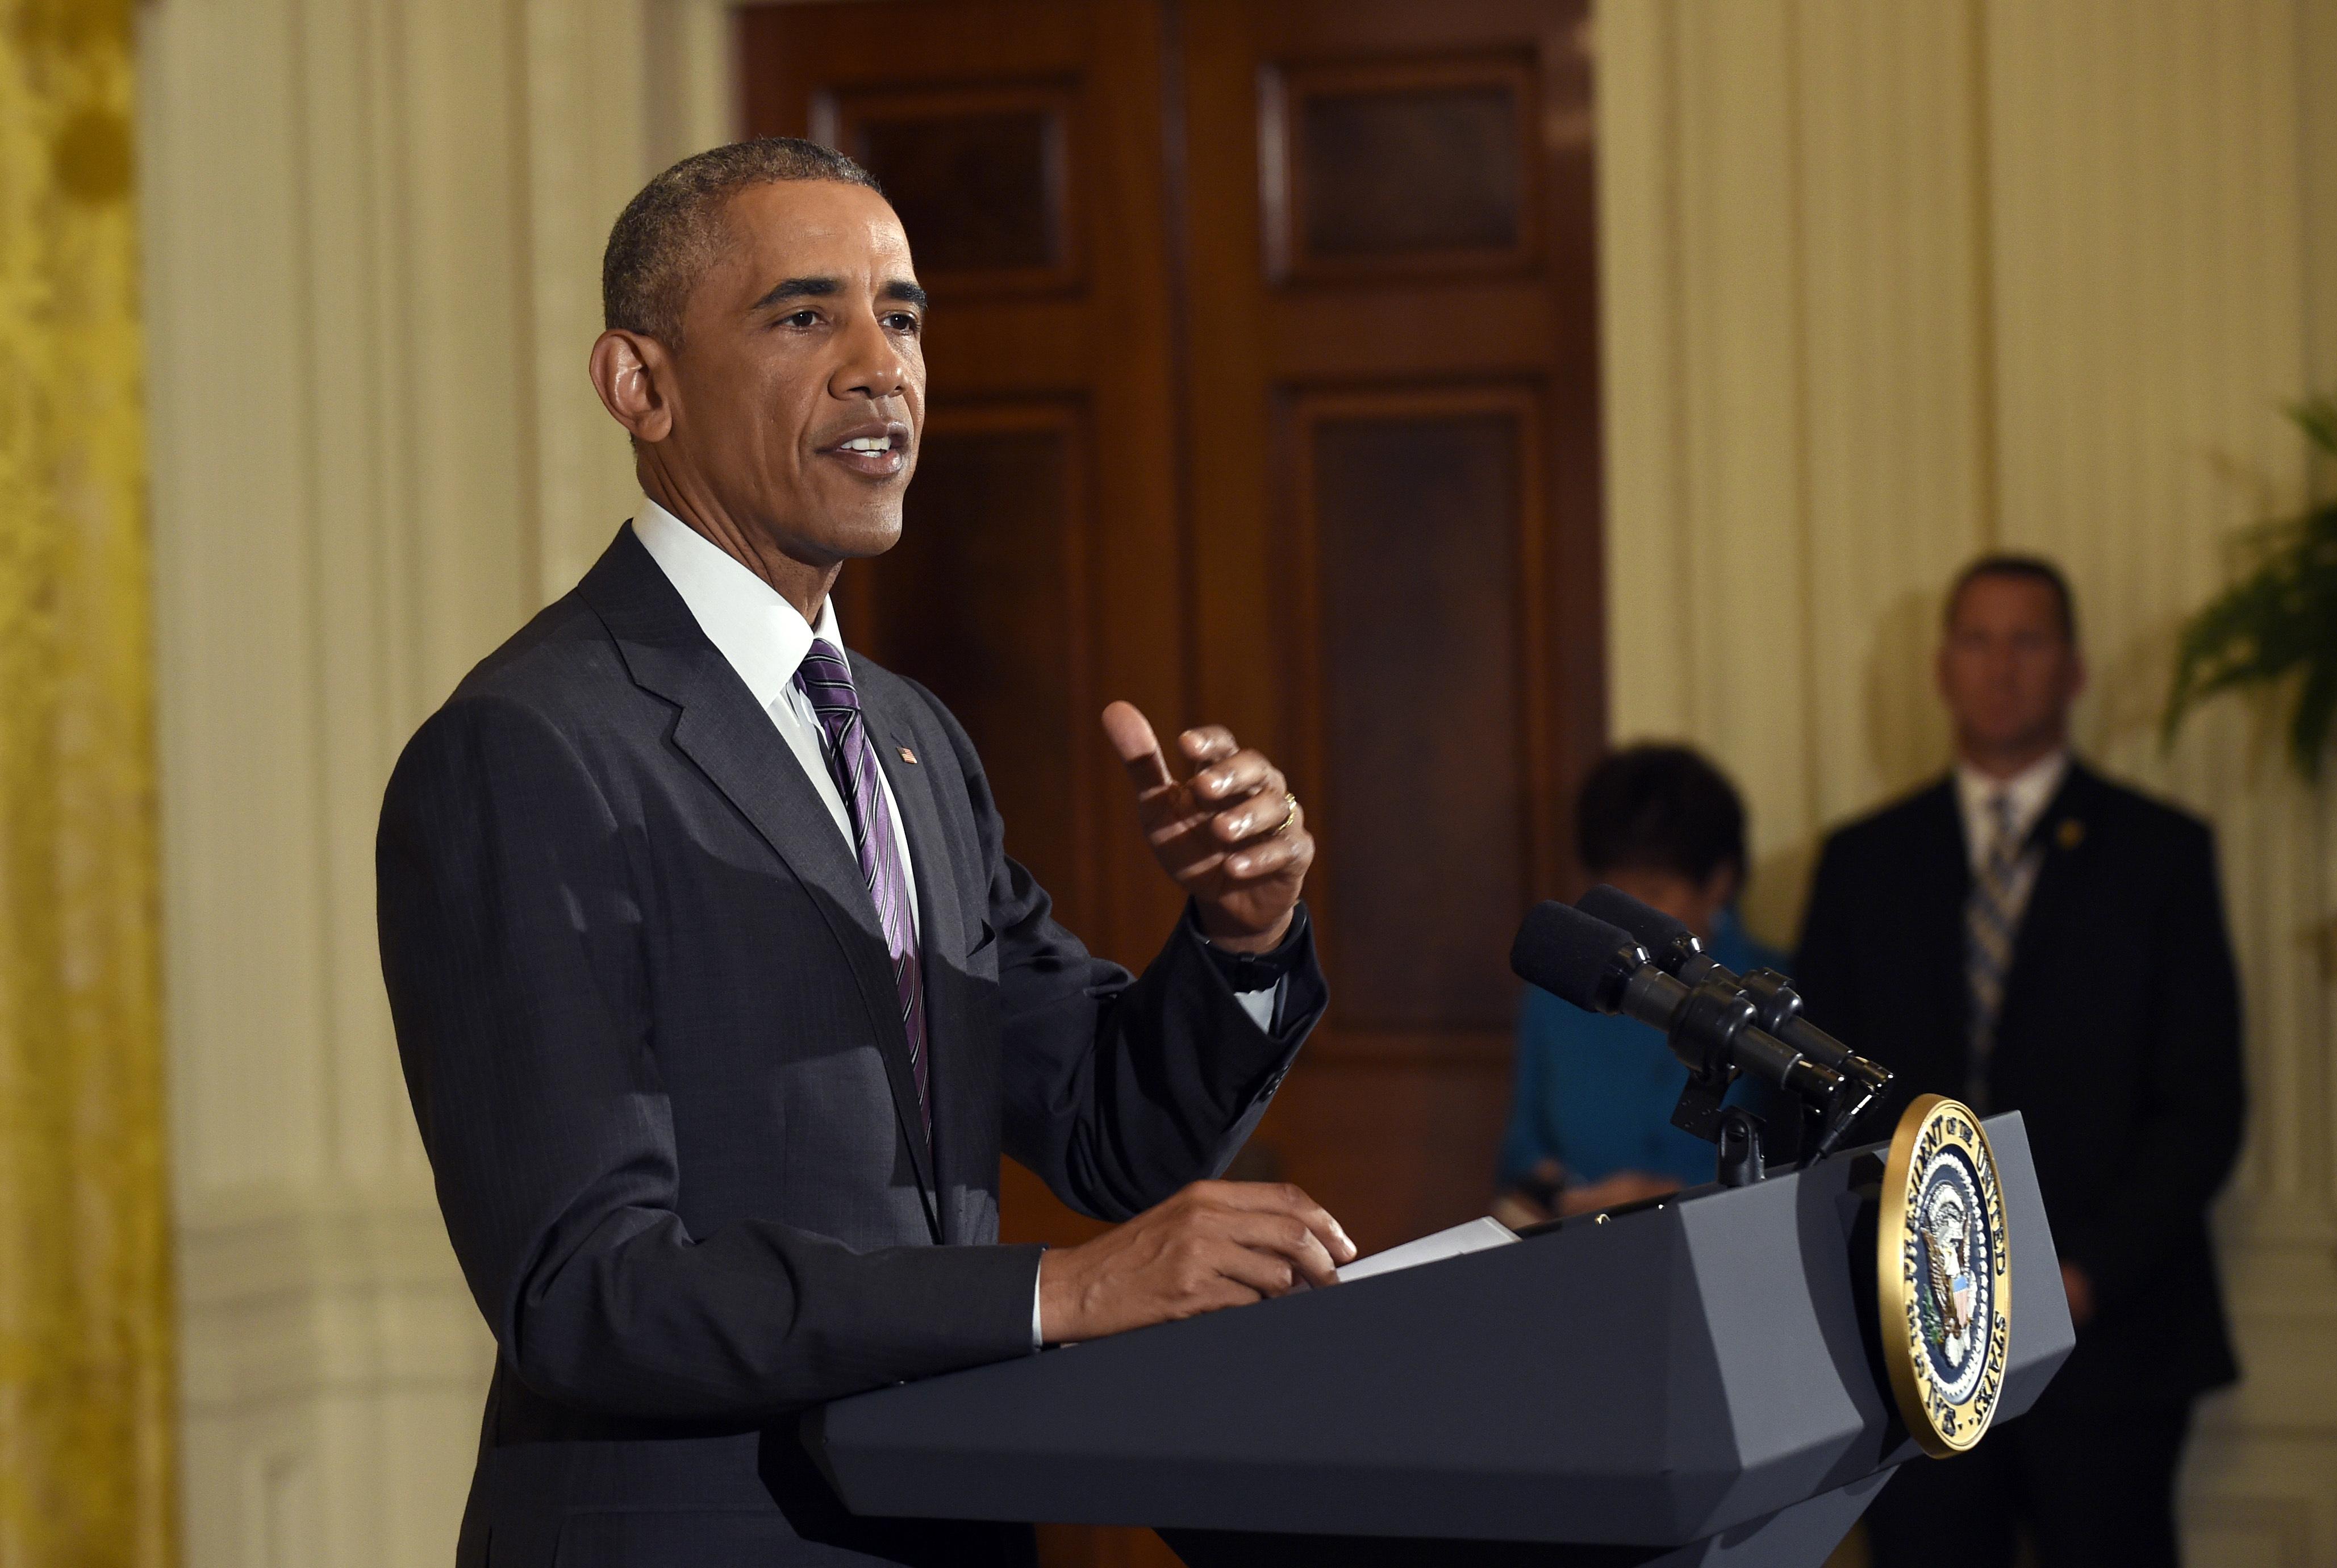 president barack obamas legacy 'the legacy of barack obama' – fareed zakaria explores the 44th president's tenure in new primetime special new fareed zakaria primetime special premieres 9:00pm wednesday, dec 07.